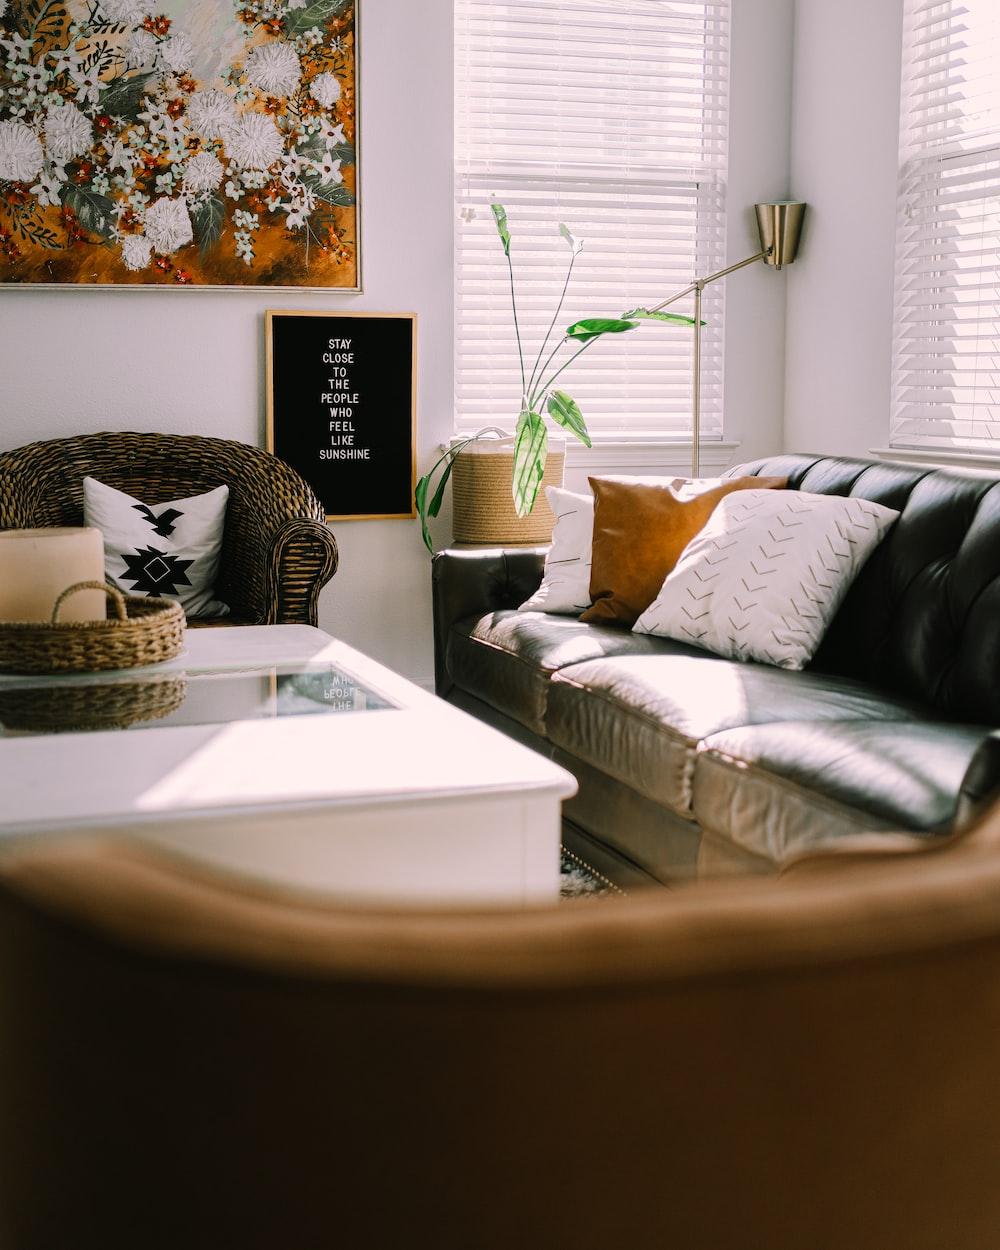 white and black throw pillows on white bed